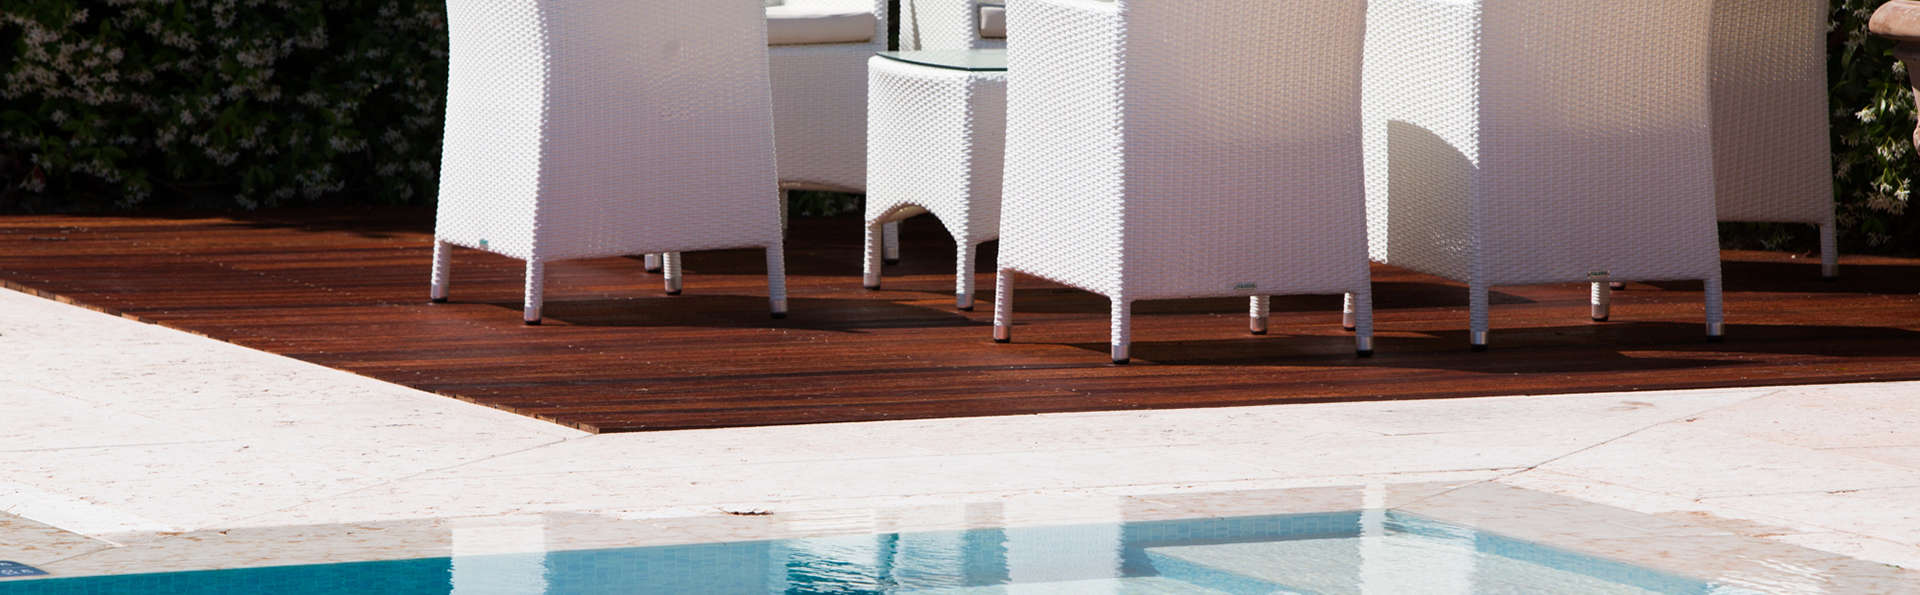 Relais Villa Abbondanzi - edit_new_terrace.jpg